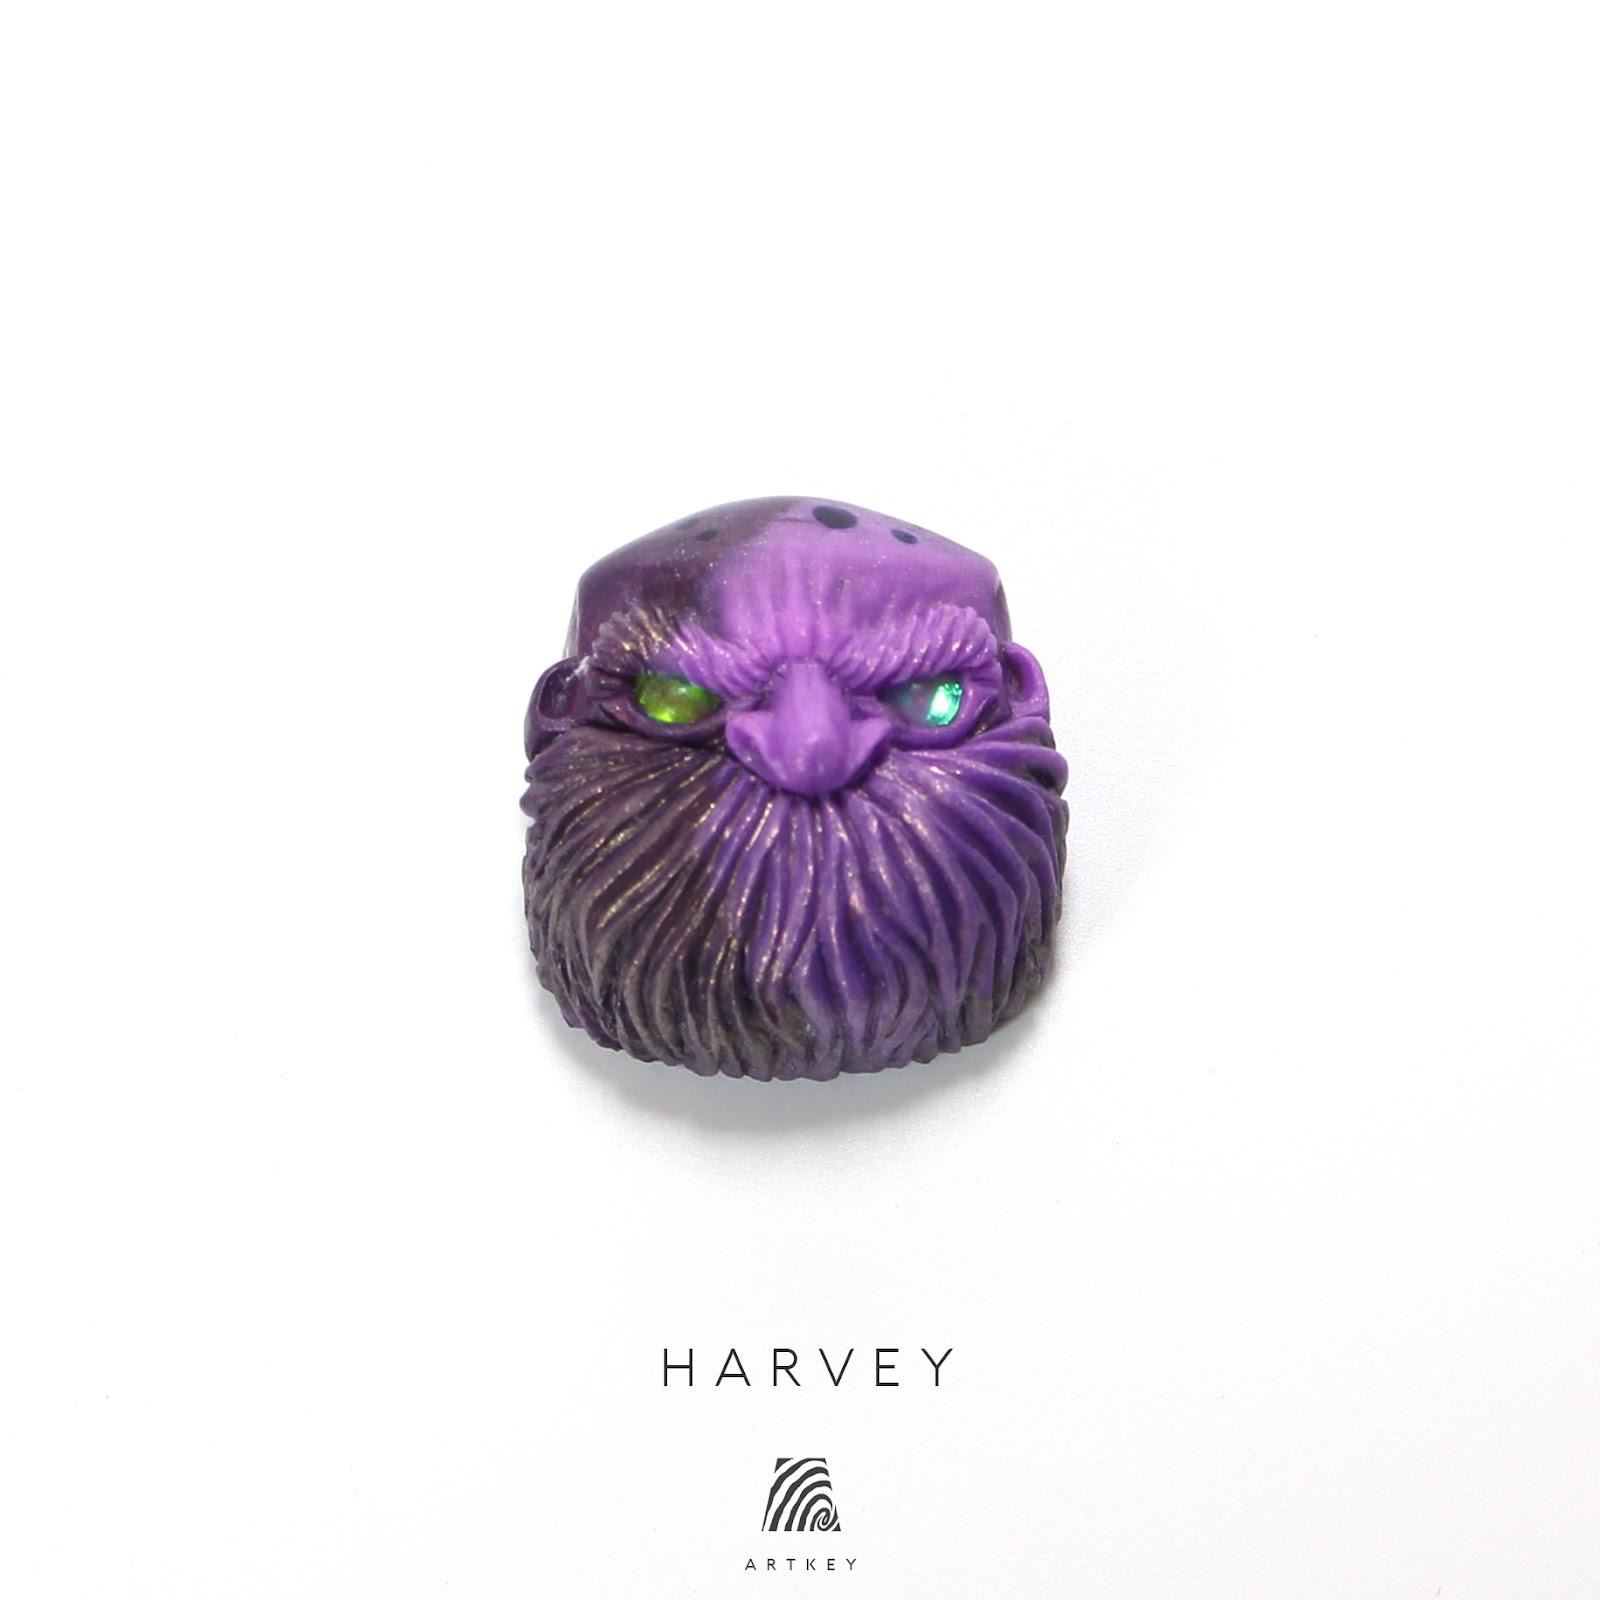 Artkey - Harvey Jack Bald